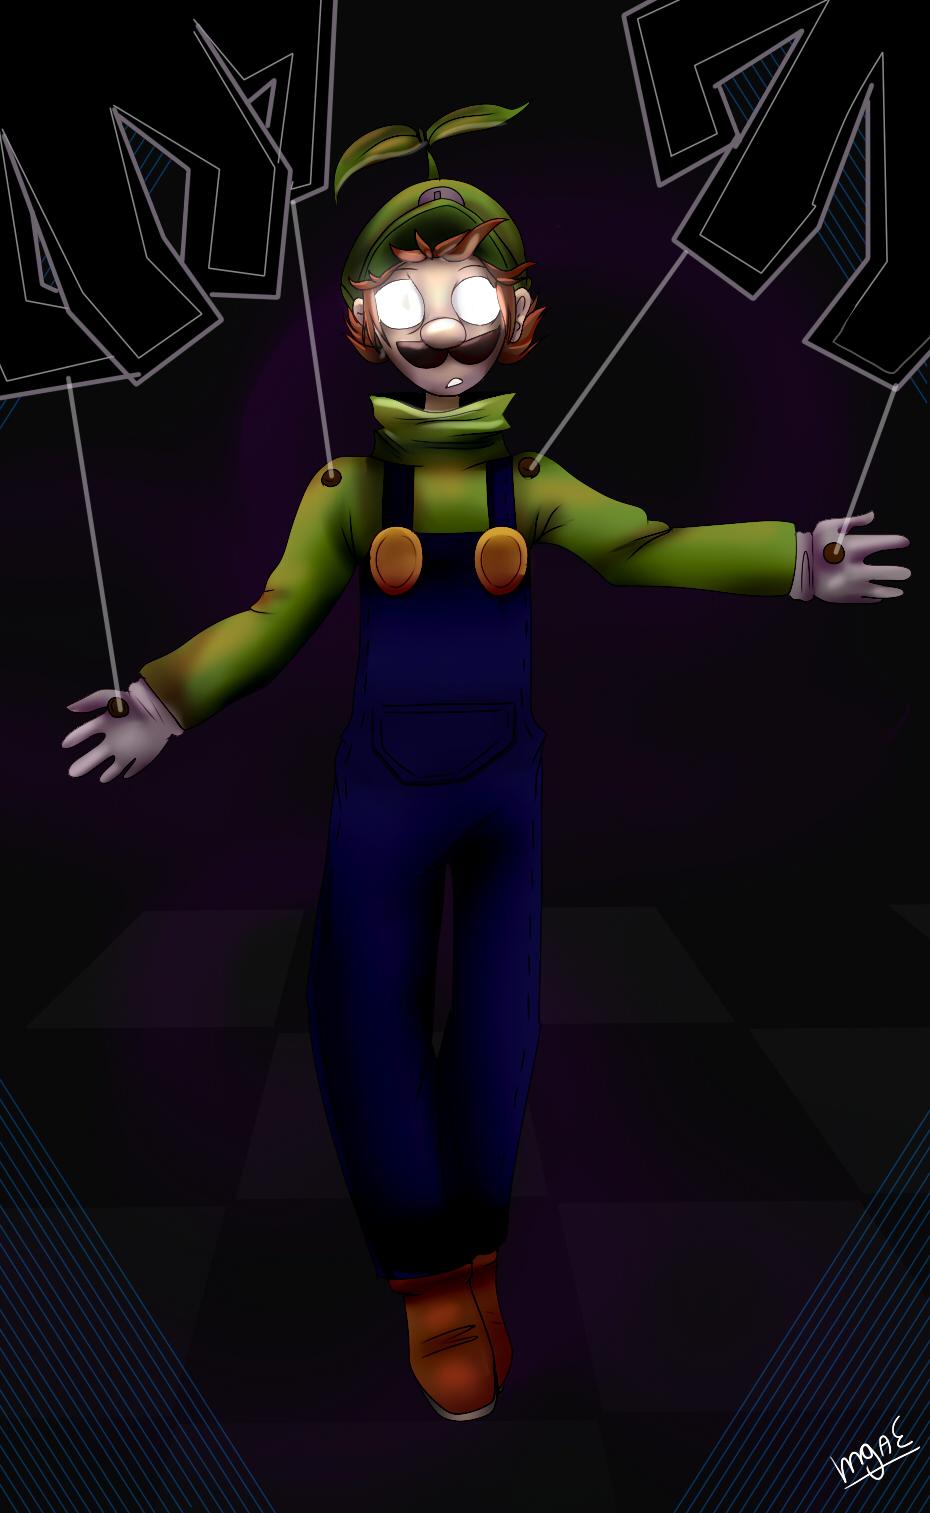 Luigi Marionette by mariogamesandenemies